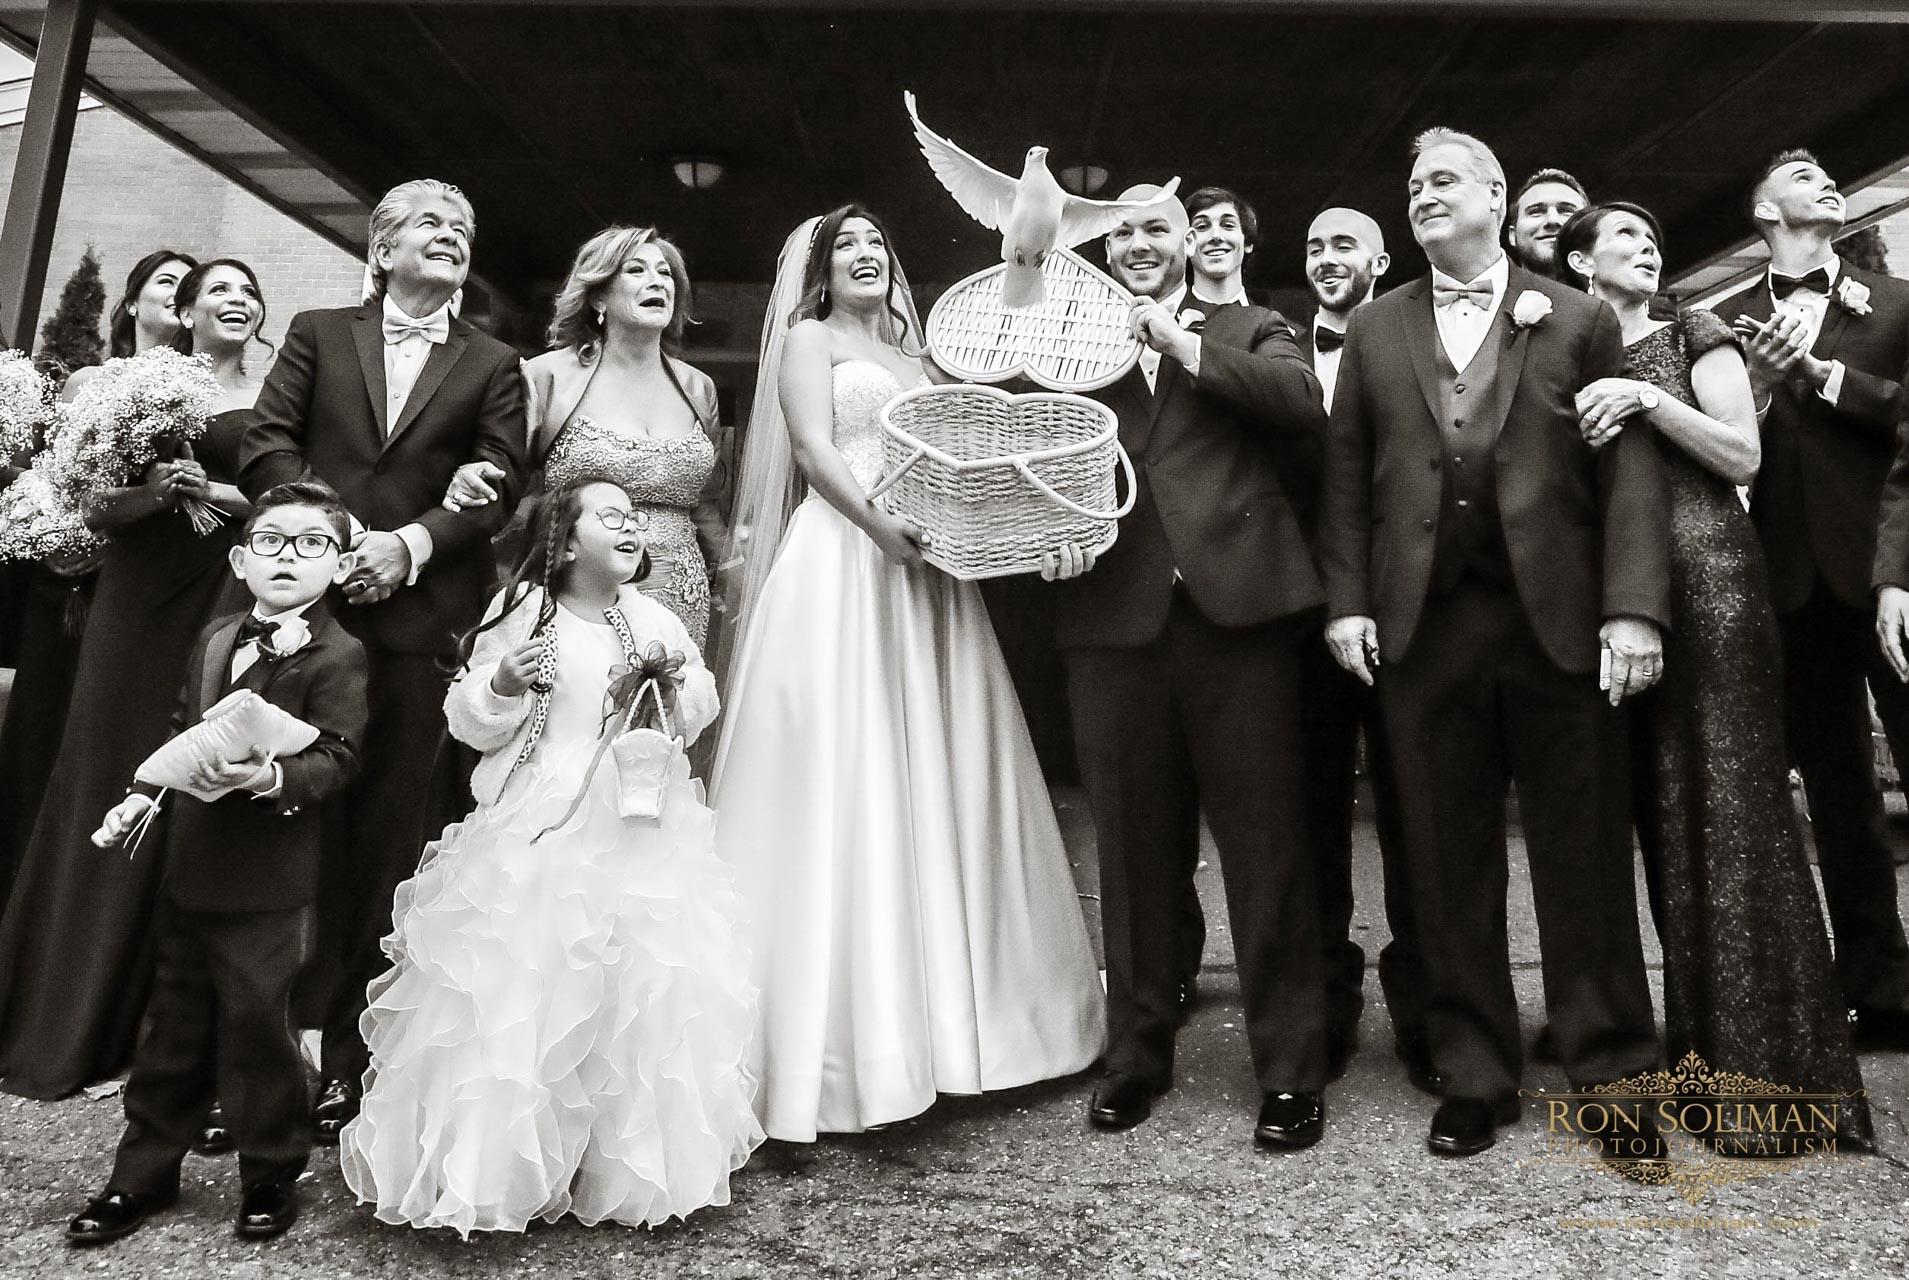 THE MERION WEDDING 19